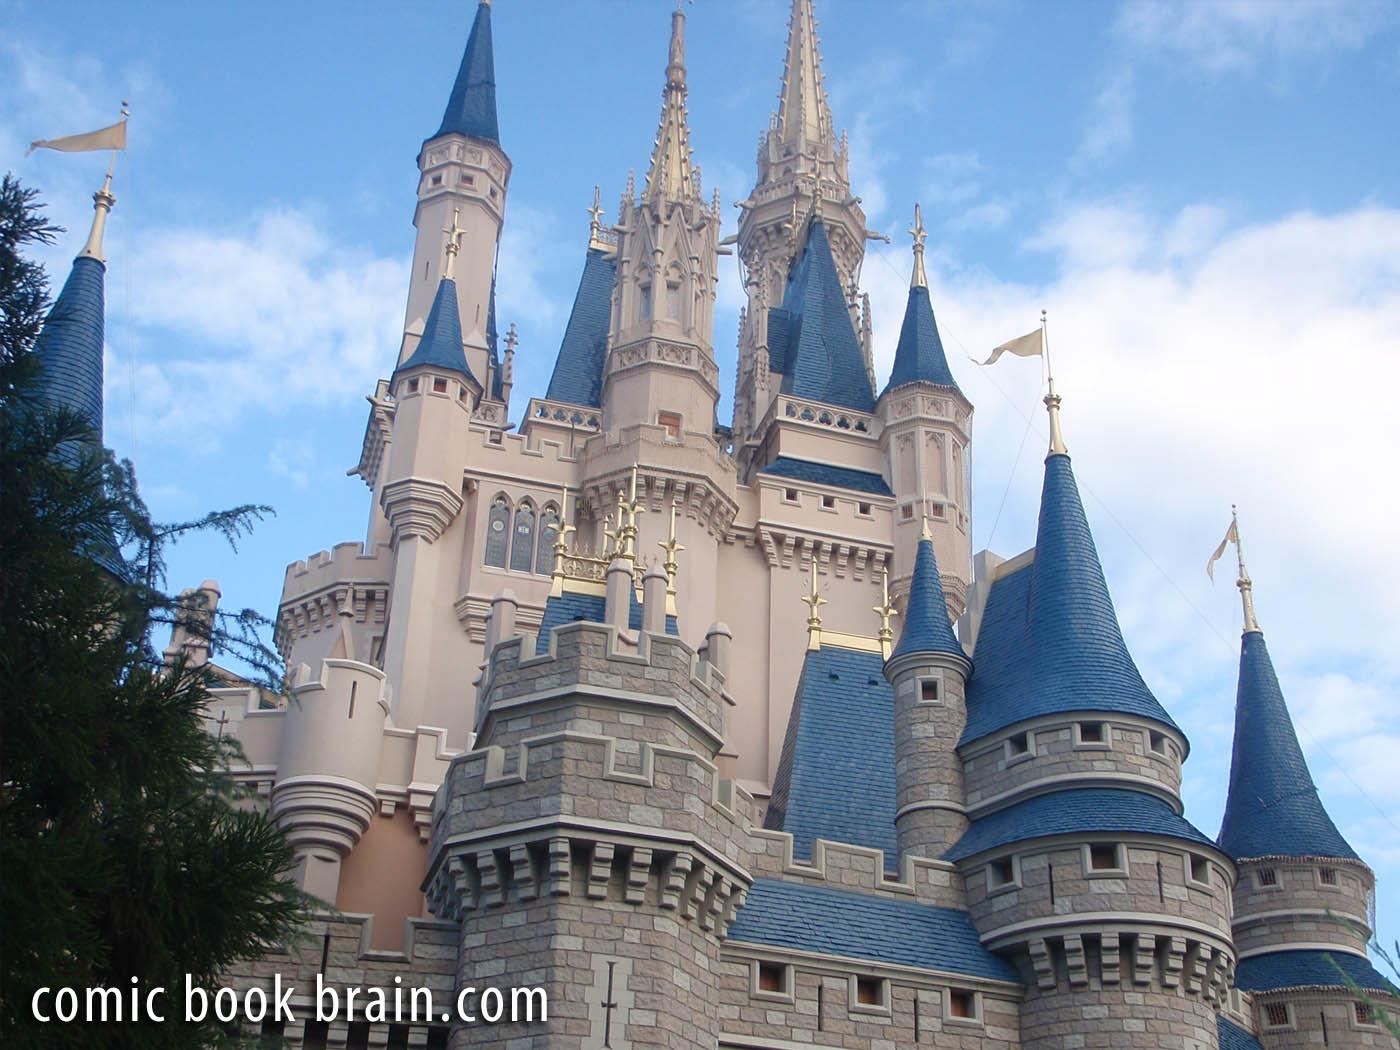 disney-castle-5.jpg